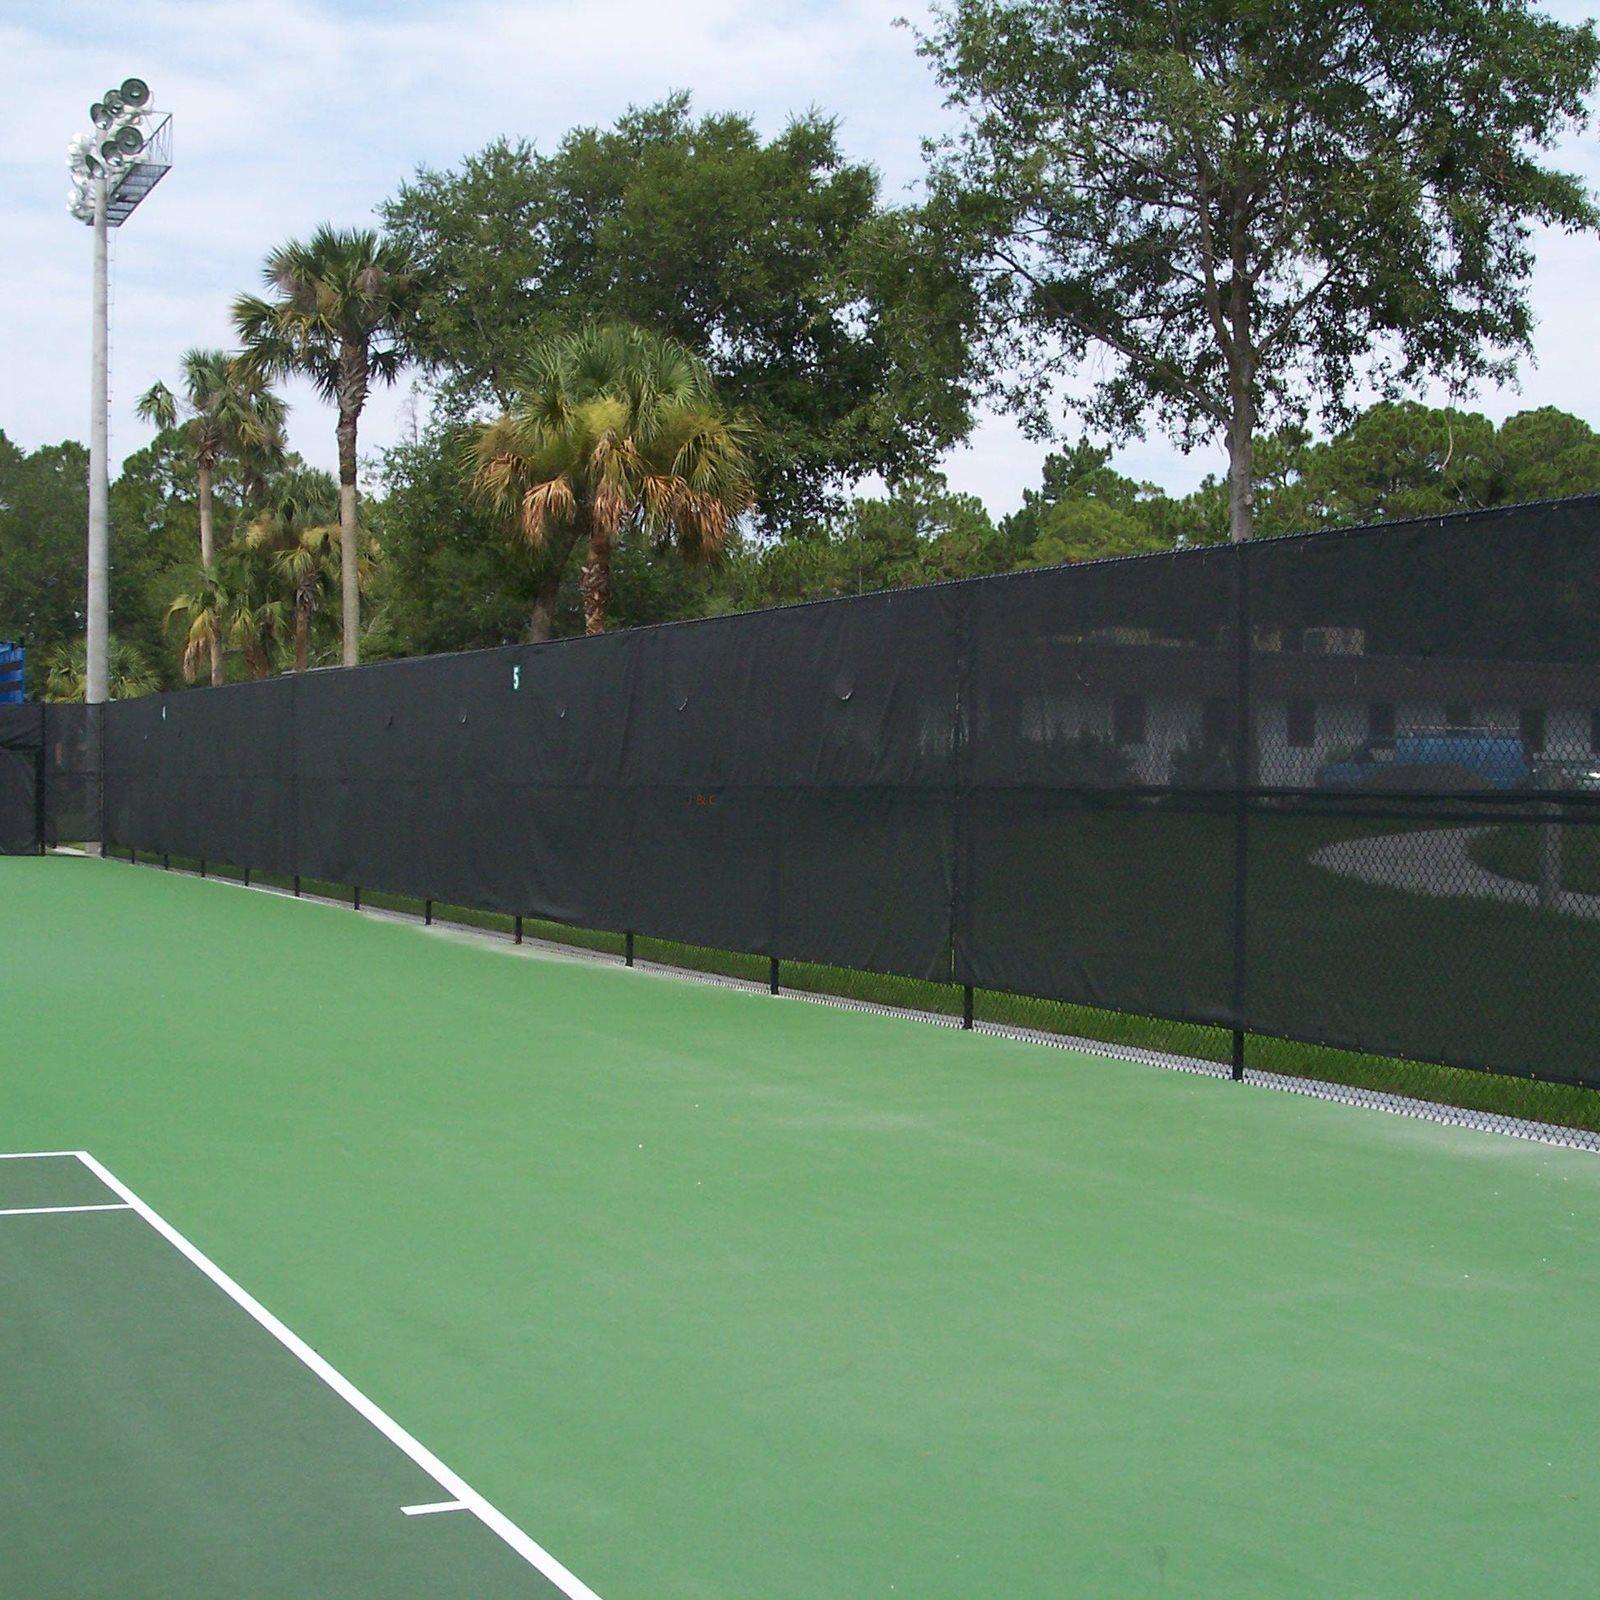 Tennis Court Screen Privacy Netting Windbreak Privacy Fence From Www Truetraders Co Uk In Dark Green In Various Grades Tennis Court Fence Screening Fence